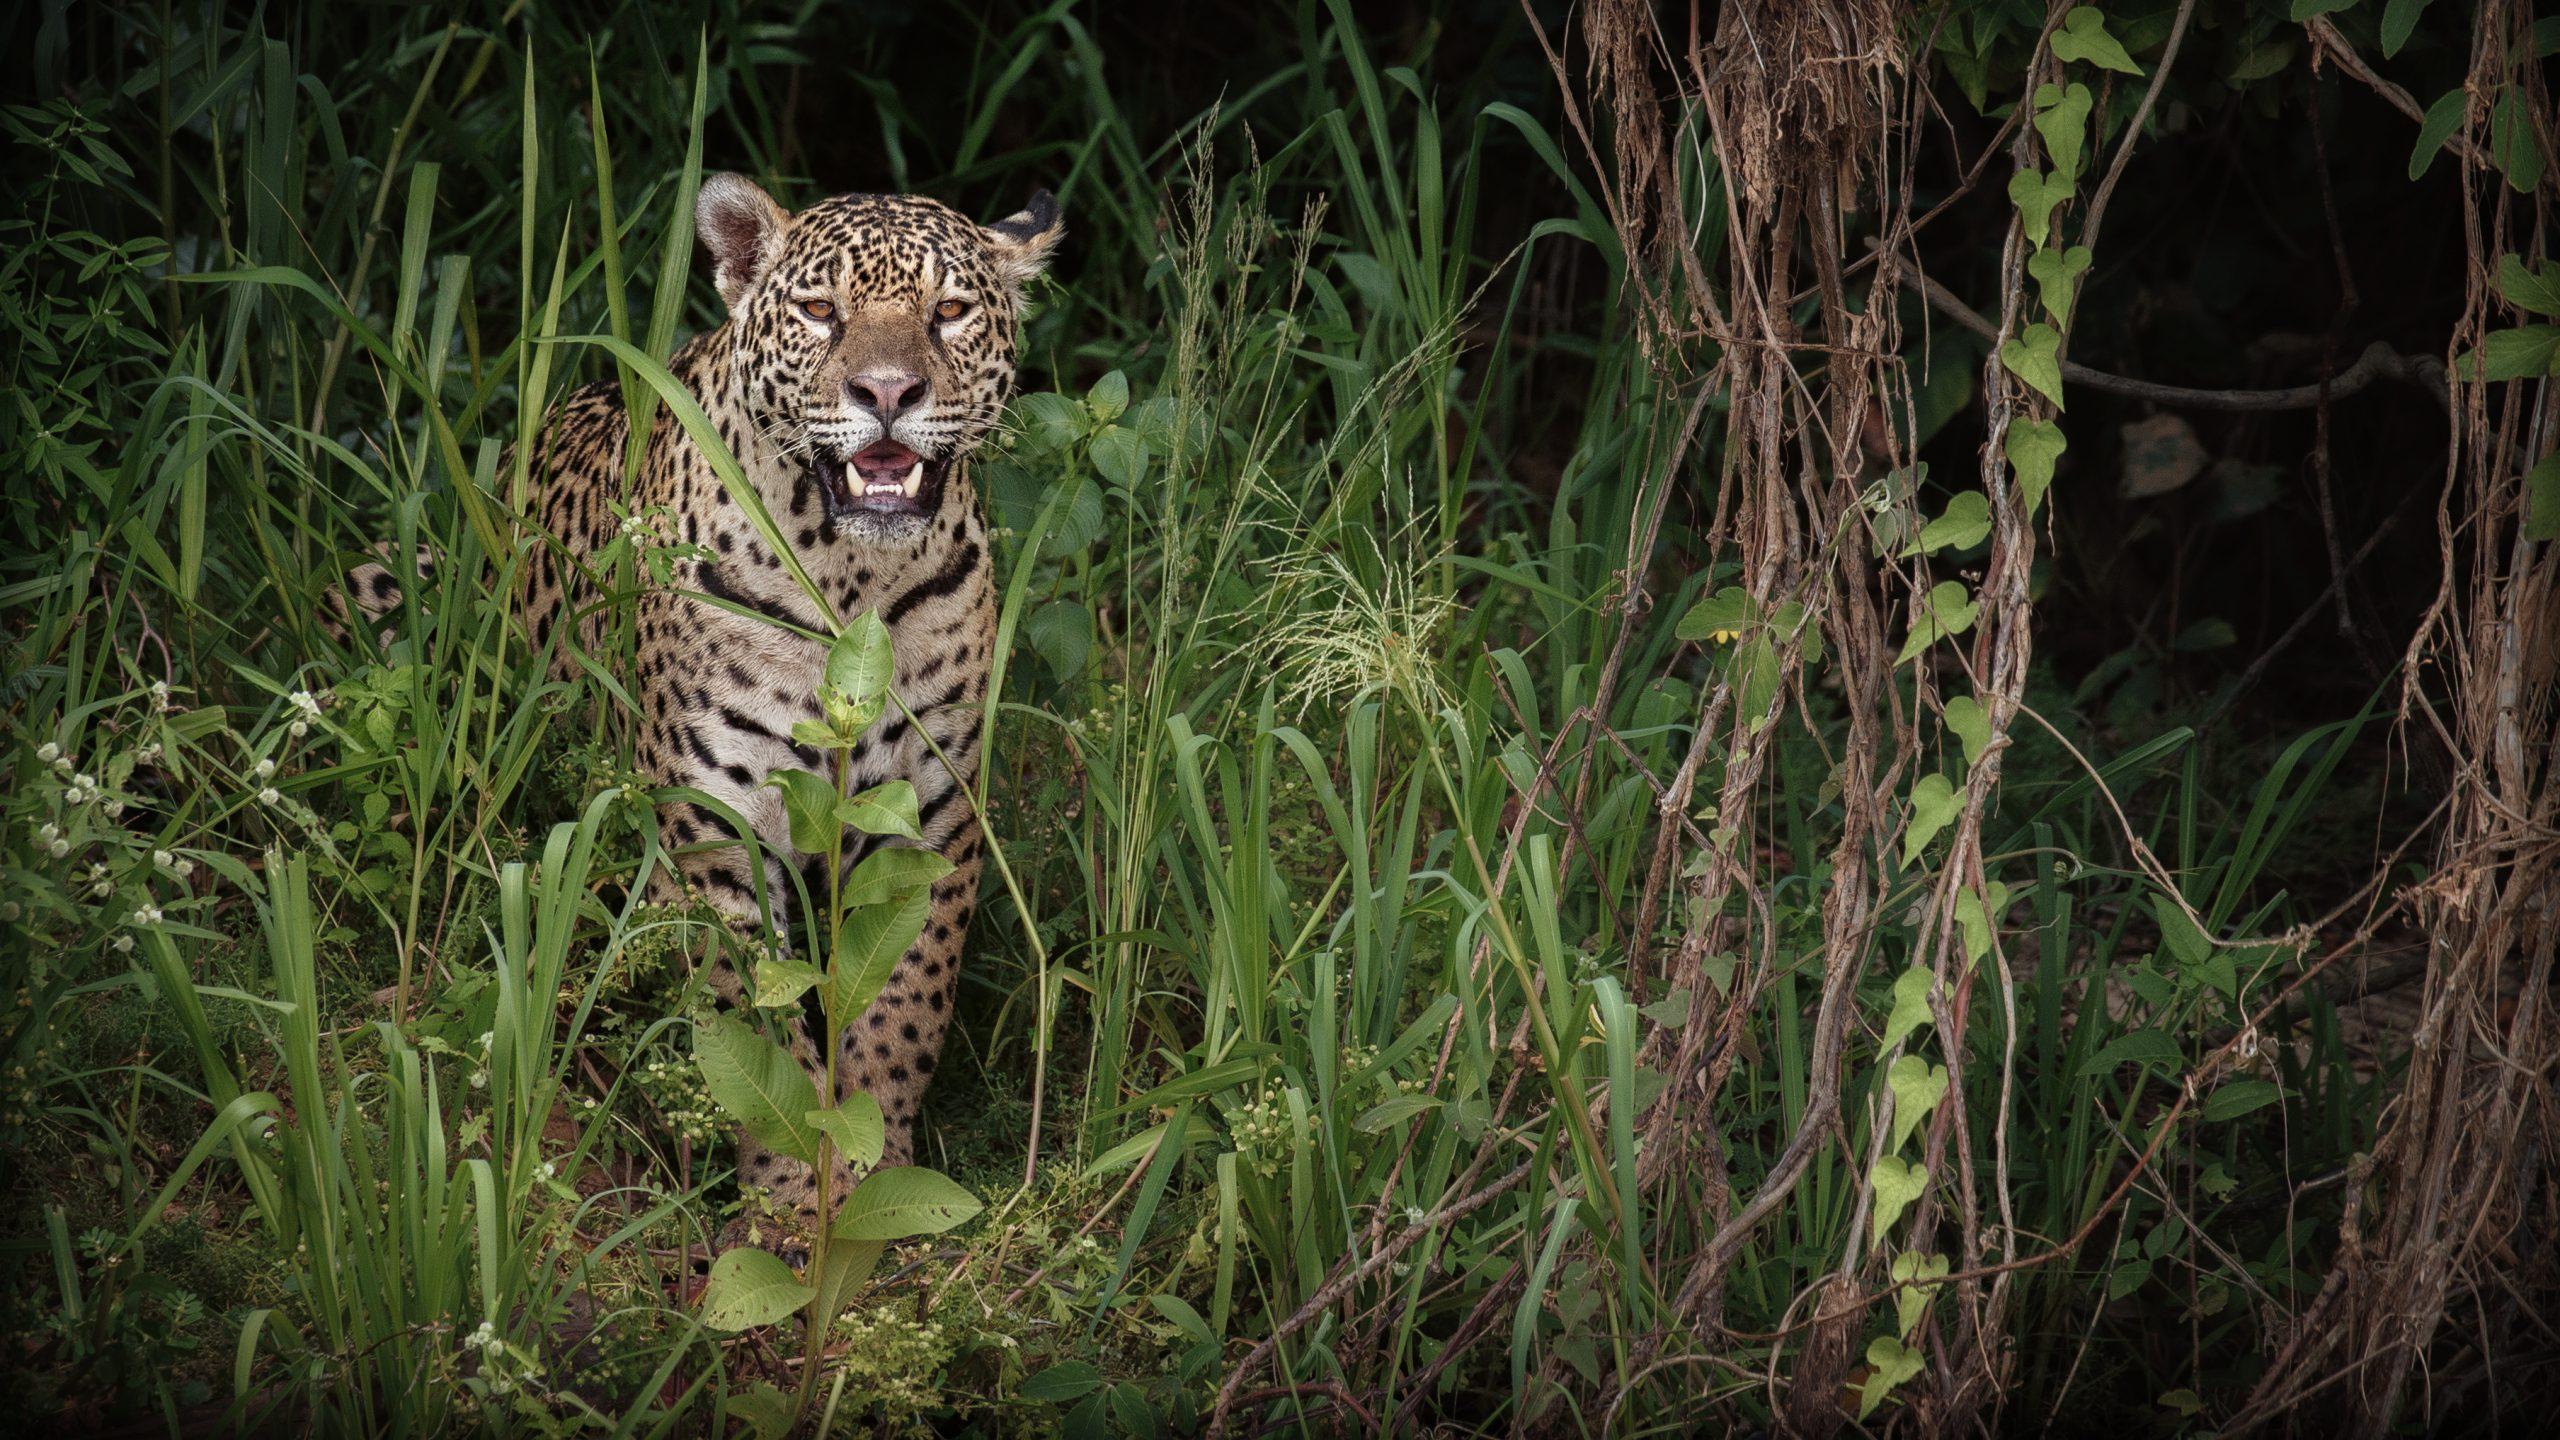 american-jaguar-female-in-the-nature-habitat-panthera-onca-wild-brasil-brasilian-wildlife-pantanal-green-jungle-big-cats